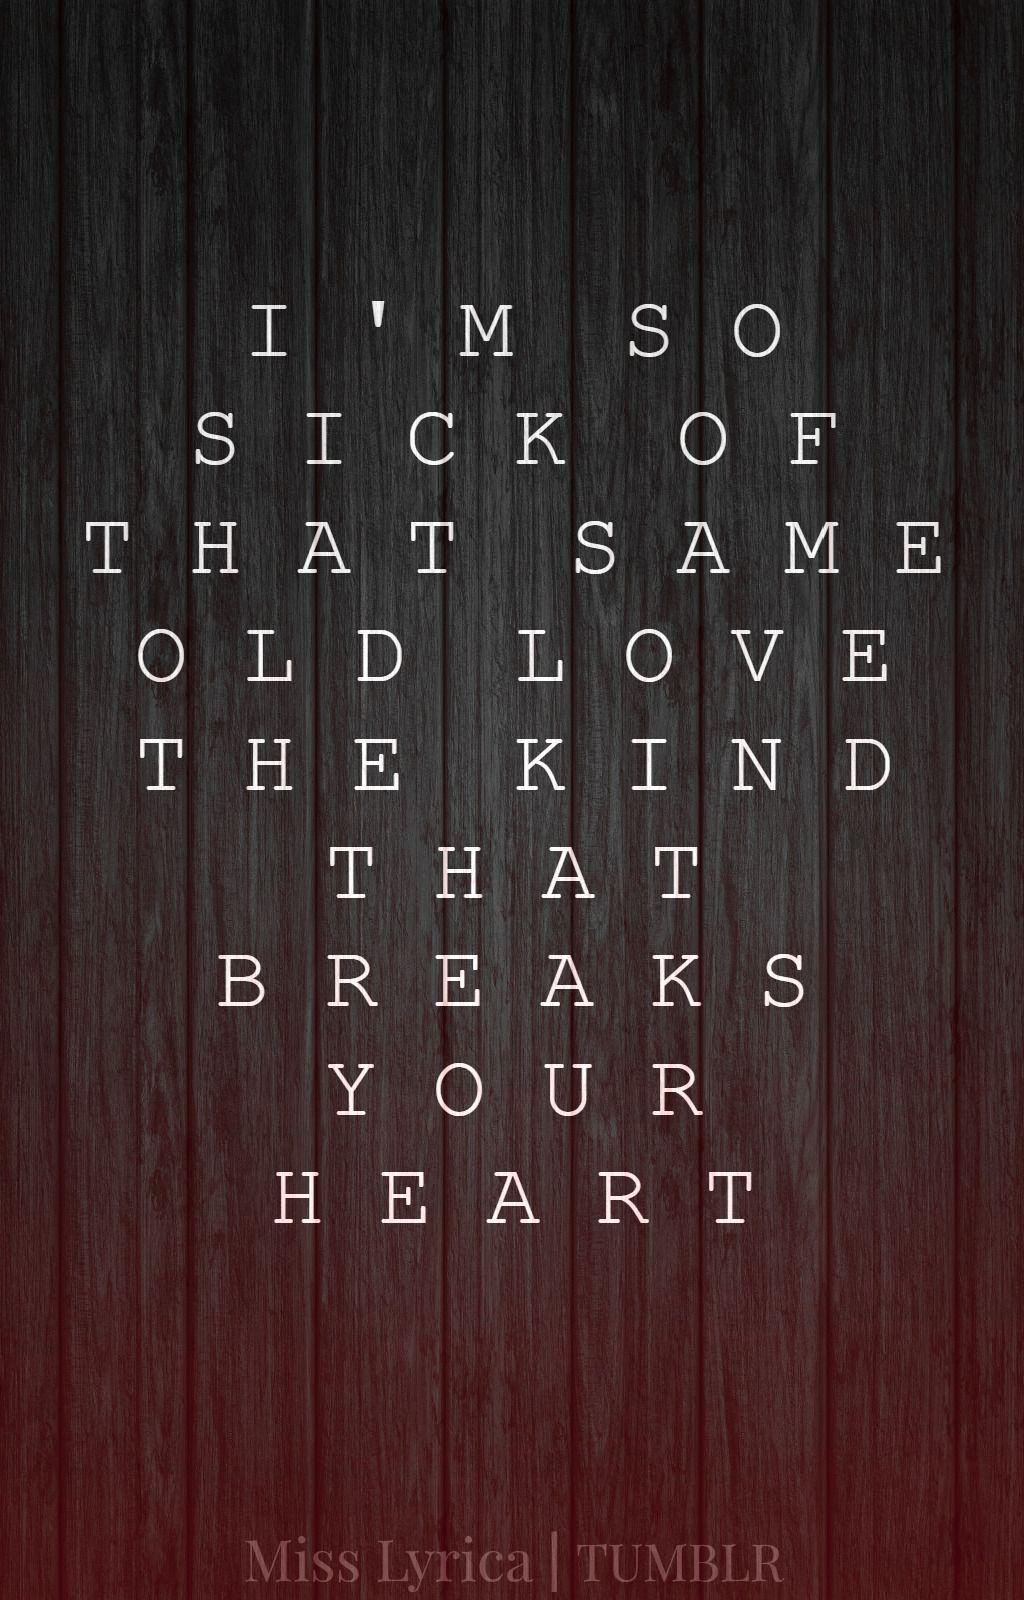 selena gomez lyrics tumblr same old love Google Search